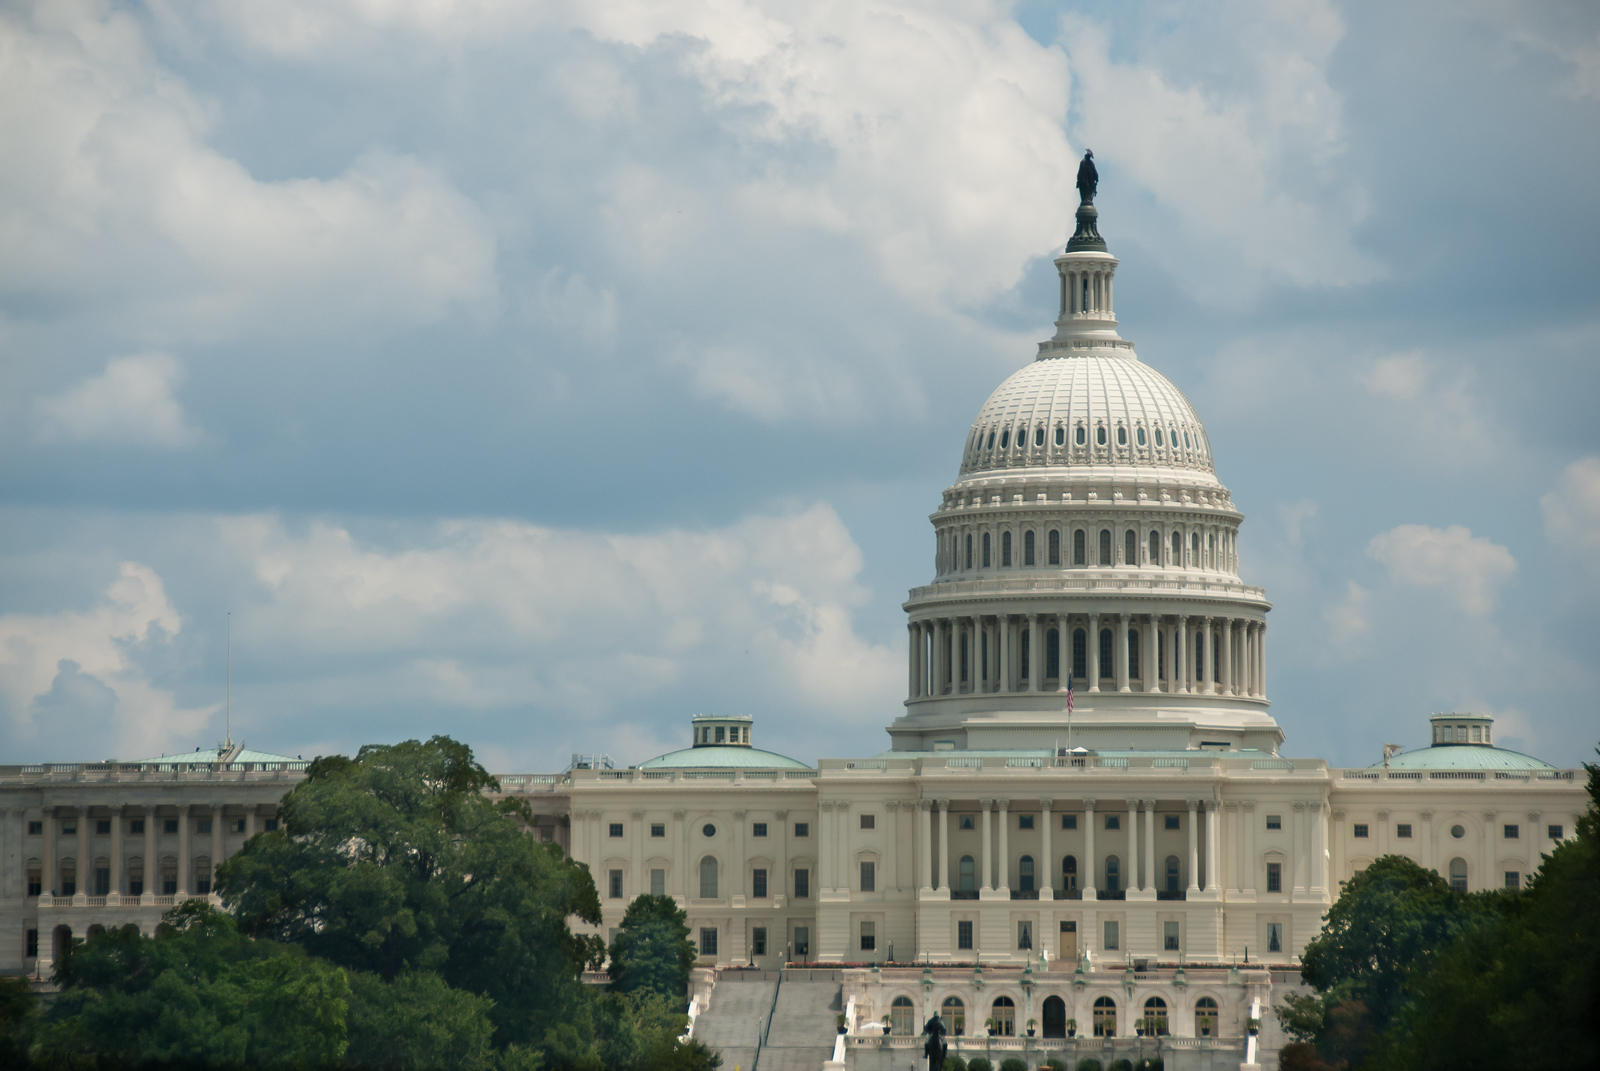 Travel to Washington DC